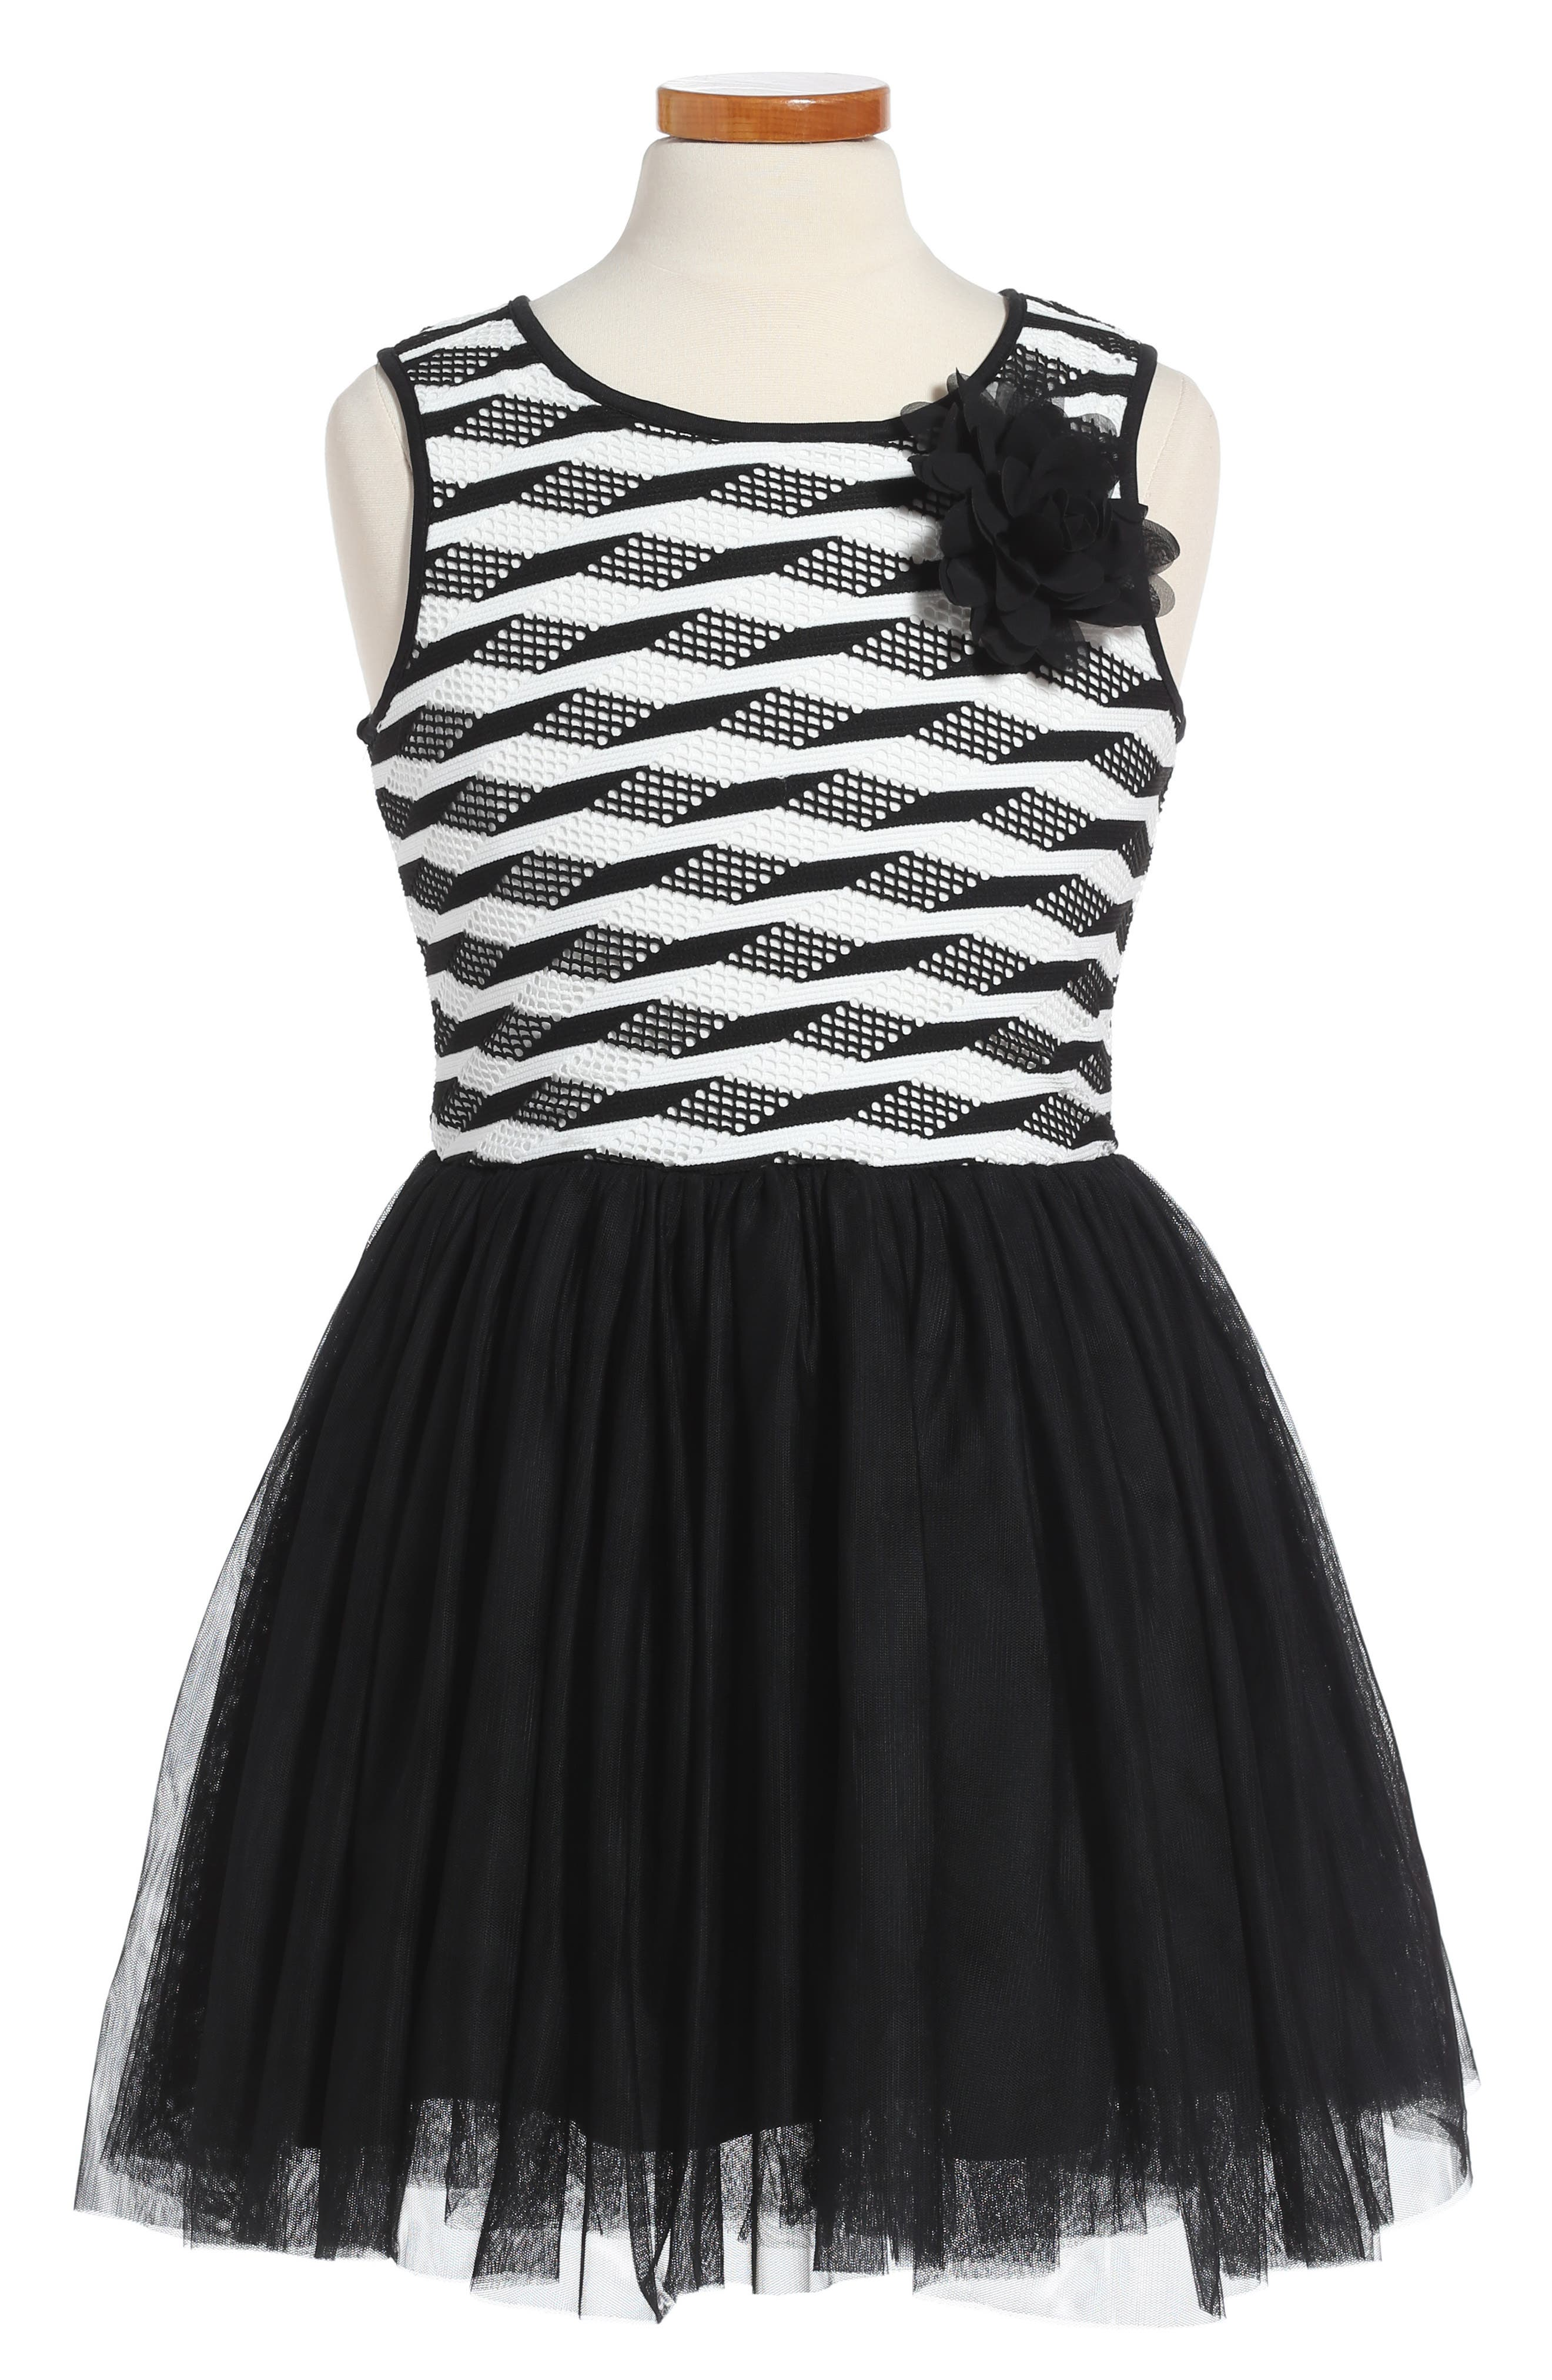 Alternate Image 1 Selected - Pippa & Julie Stripe Tutu Dress (Toddler Girls, Little Girls & Big Girls)